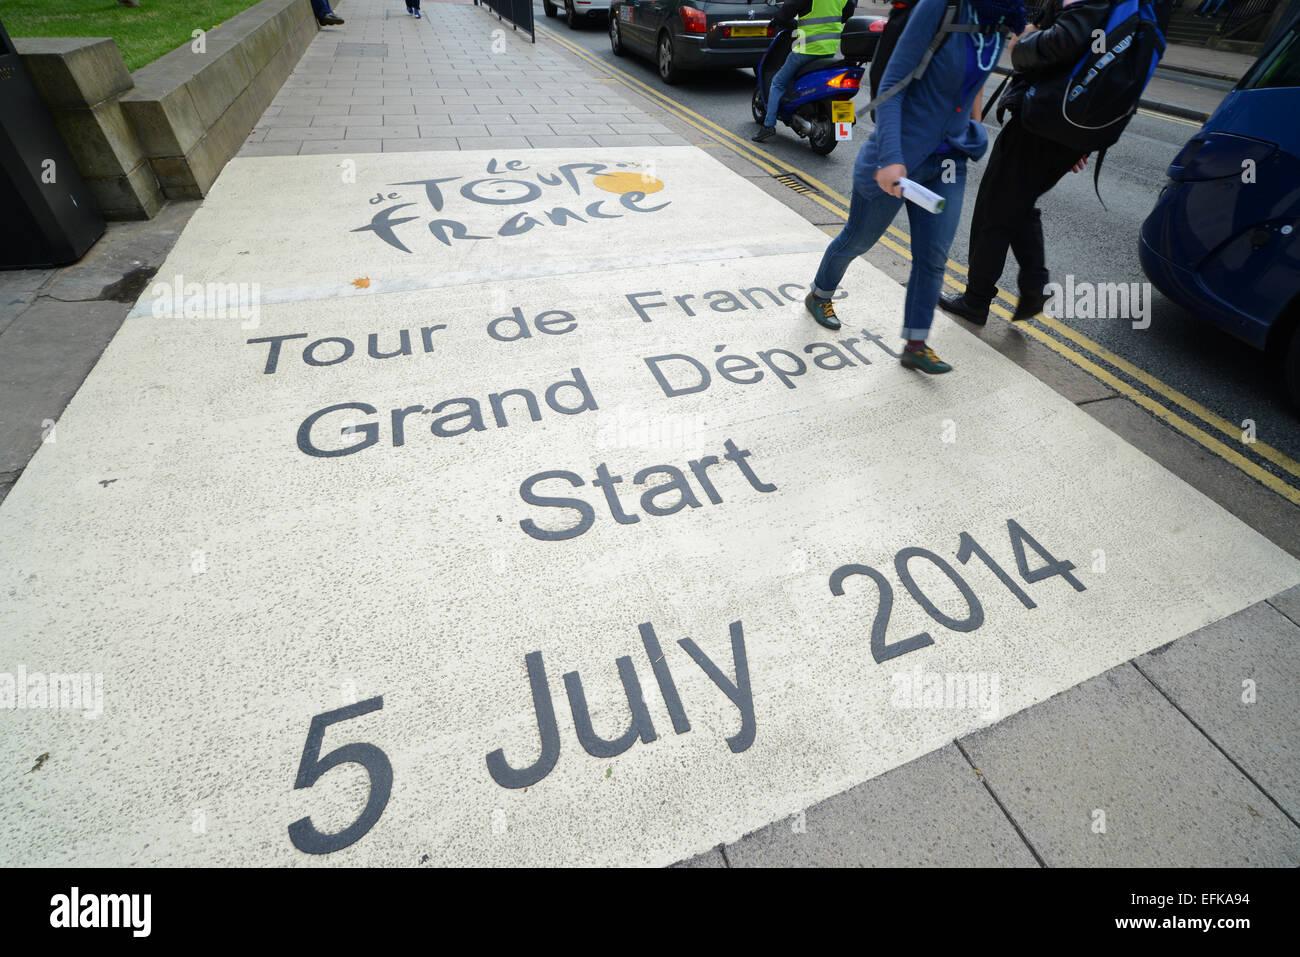 Start Tour De France In Stock Photos   Start Tour De France In Stock ... cef6cc24b